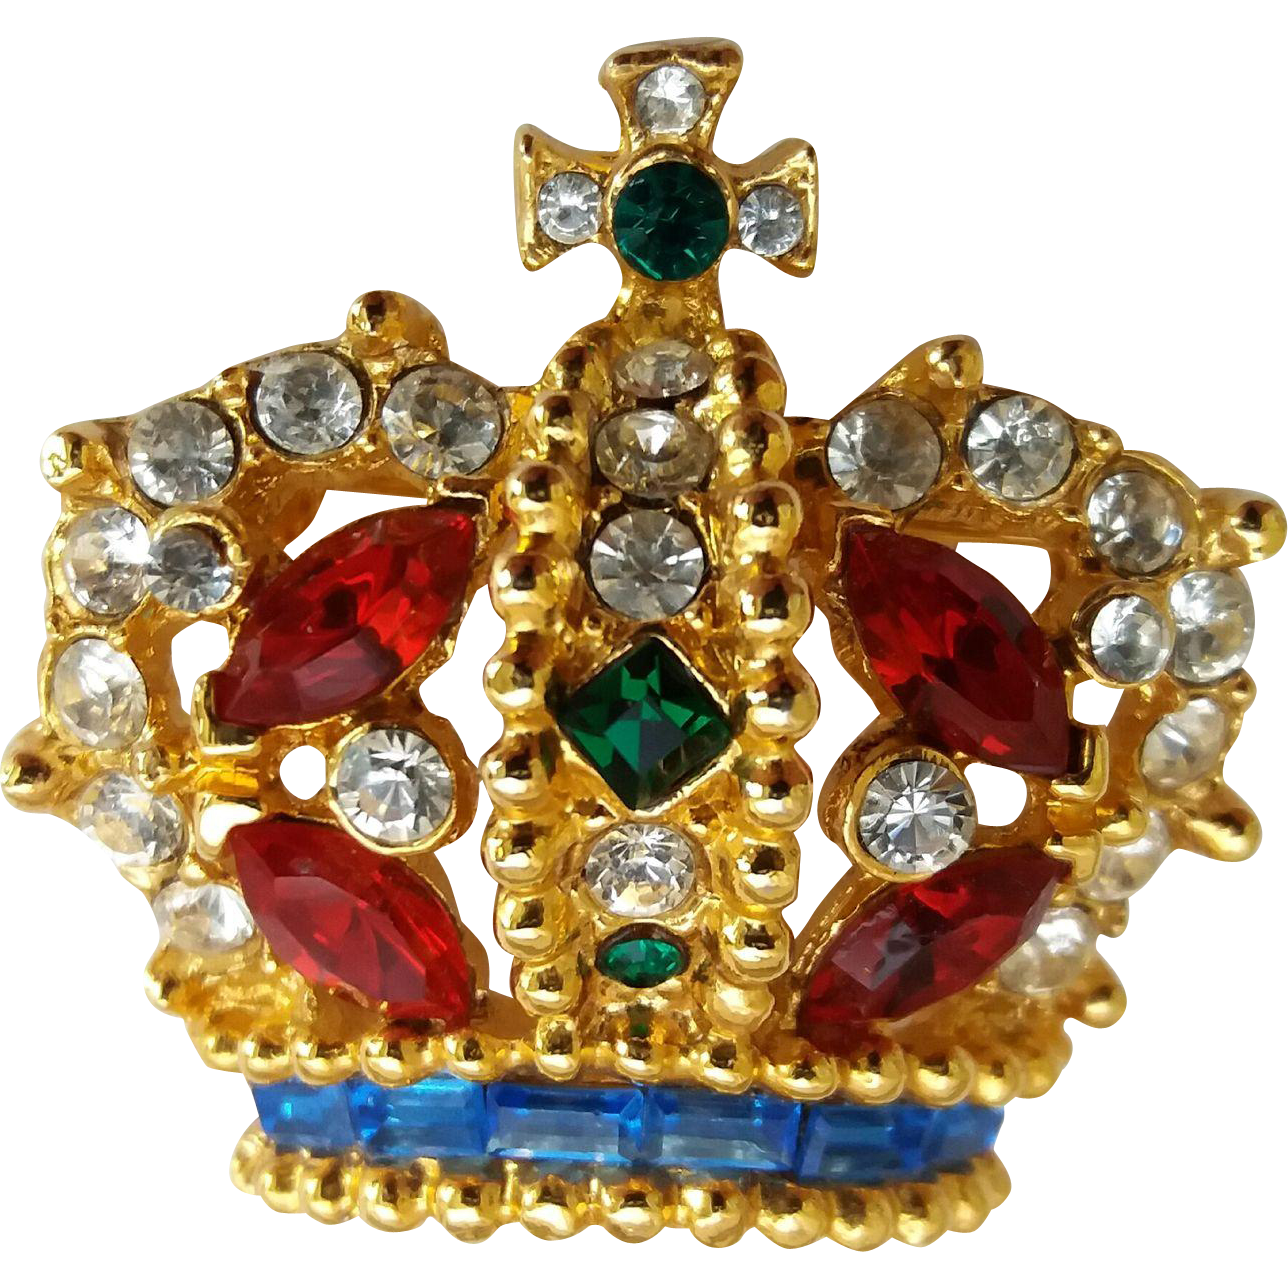 Vintage Royal Crown Colorful Rhinestone Pin Brooch Signed Carina